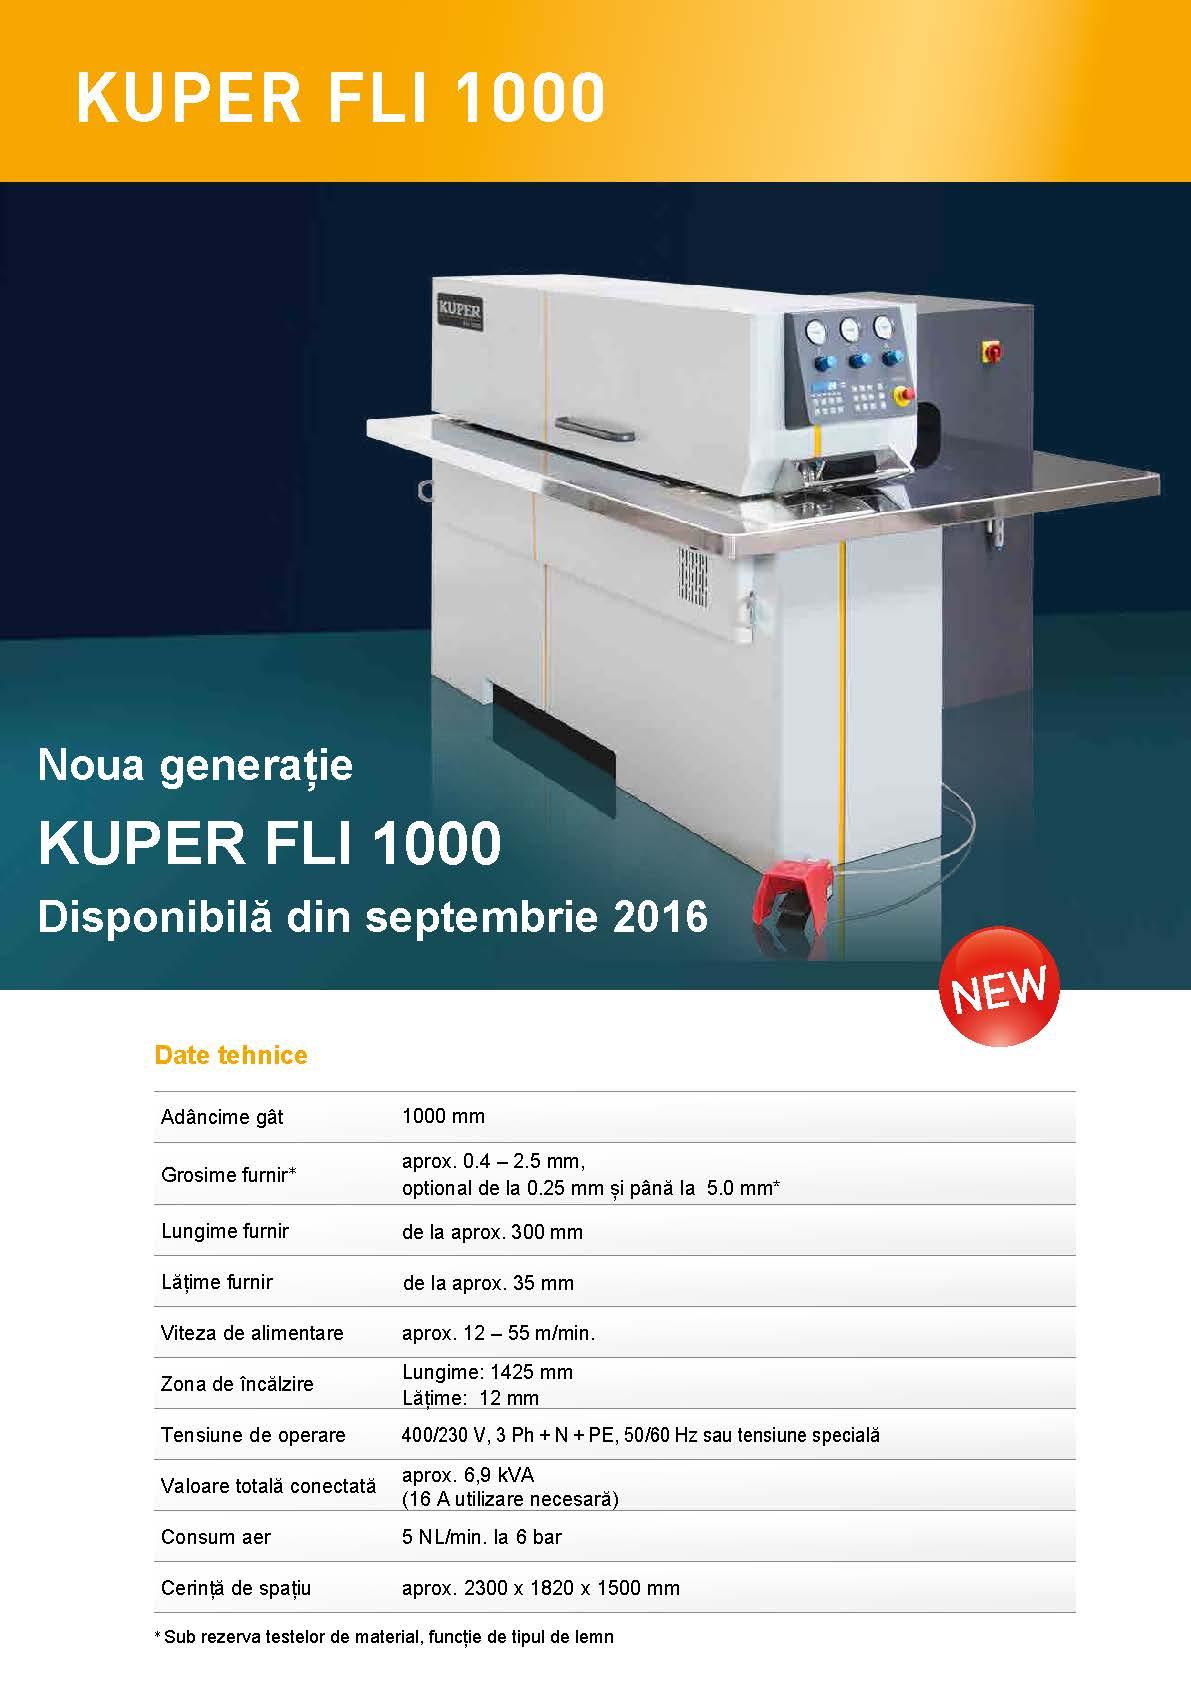 kuper-fli-1000_2016-page_3